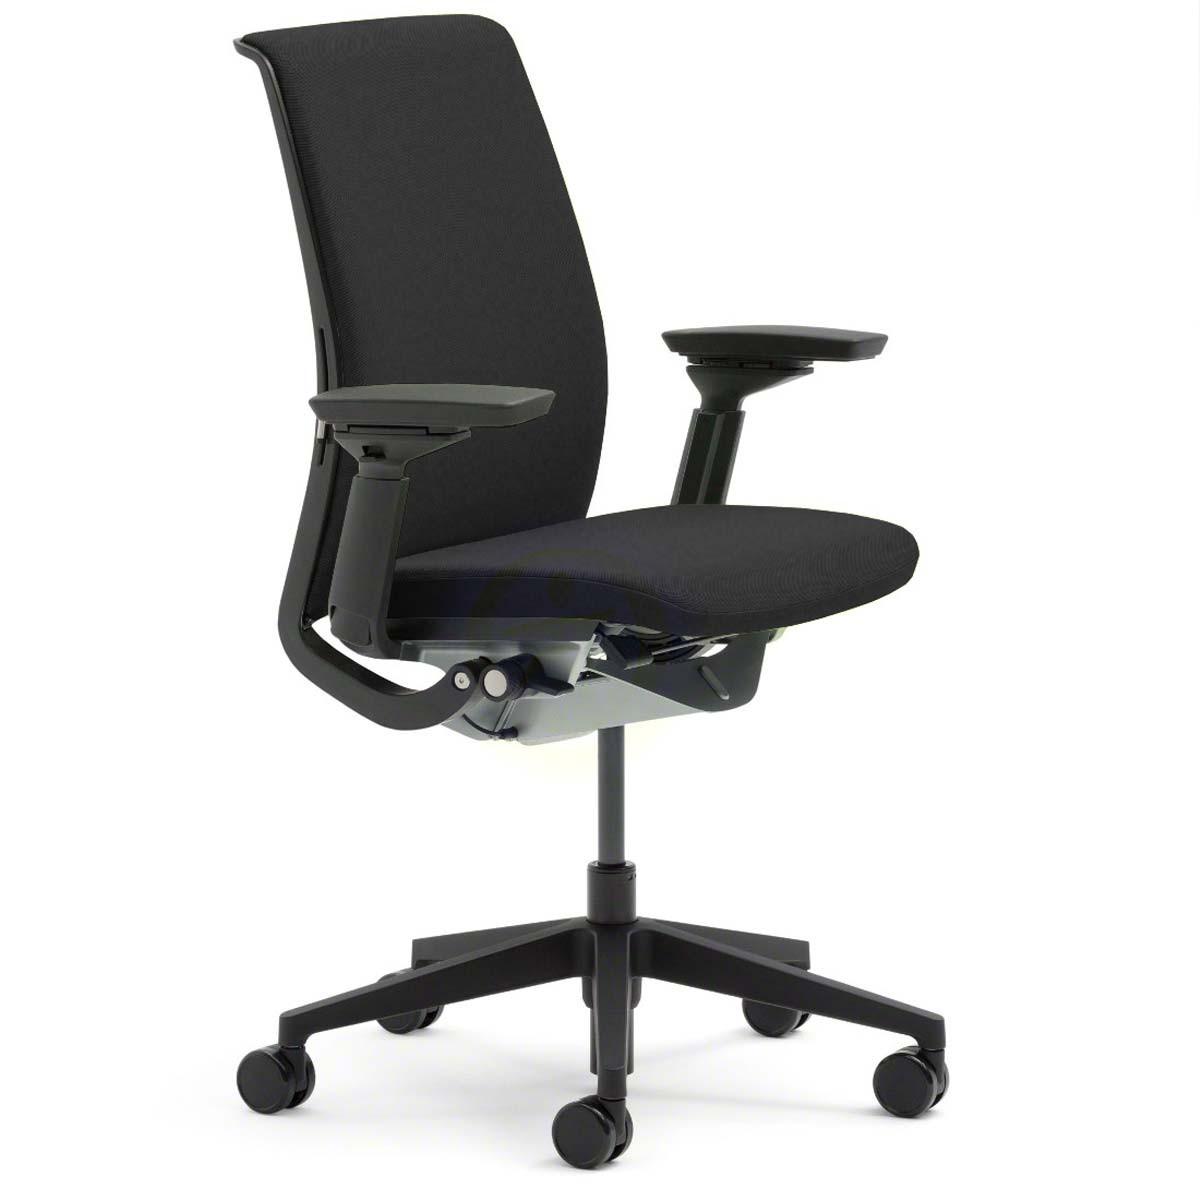 Steelcase think chair -  Steelcase Think Chair Image 1 Loading Zoom